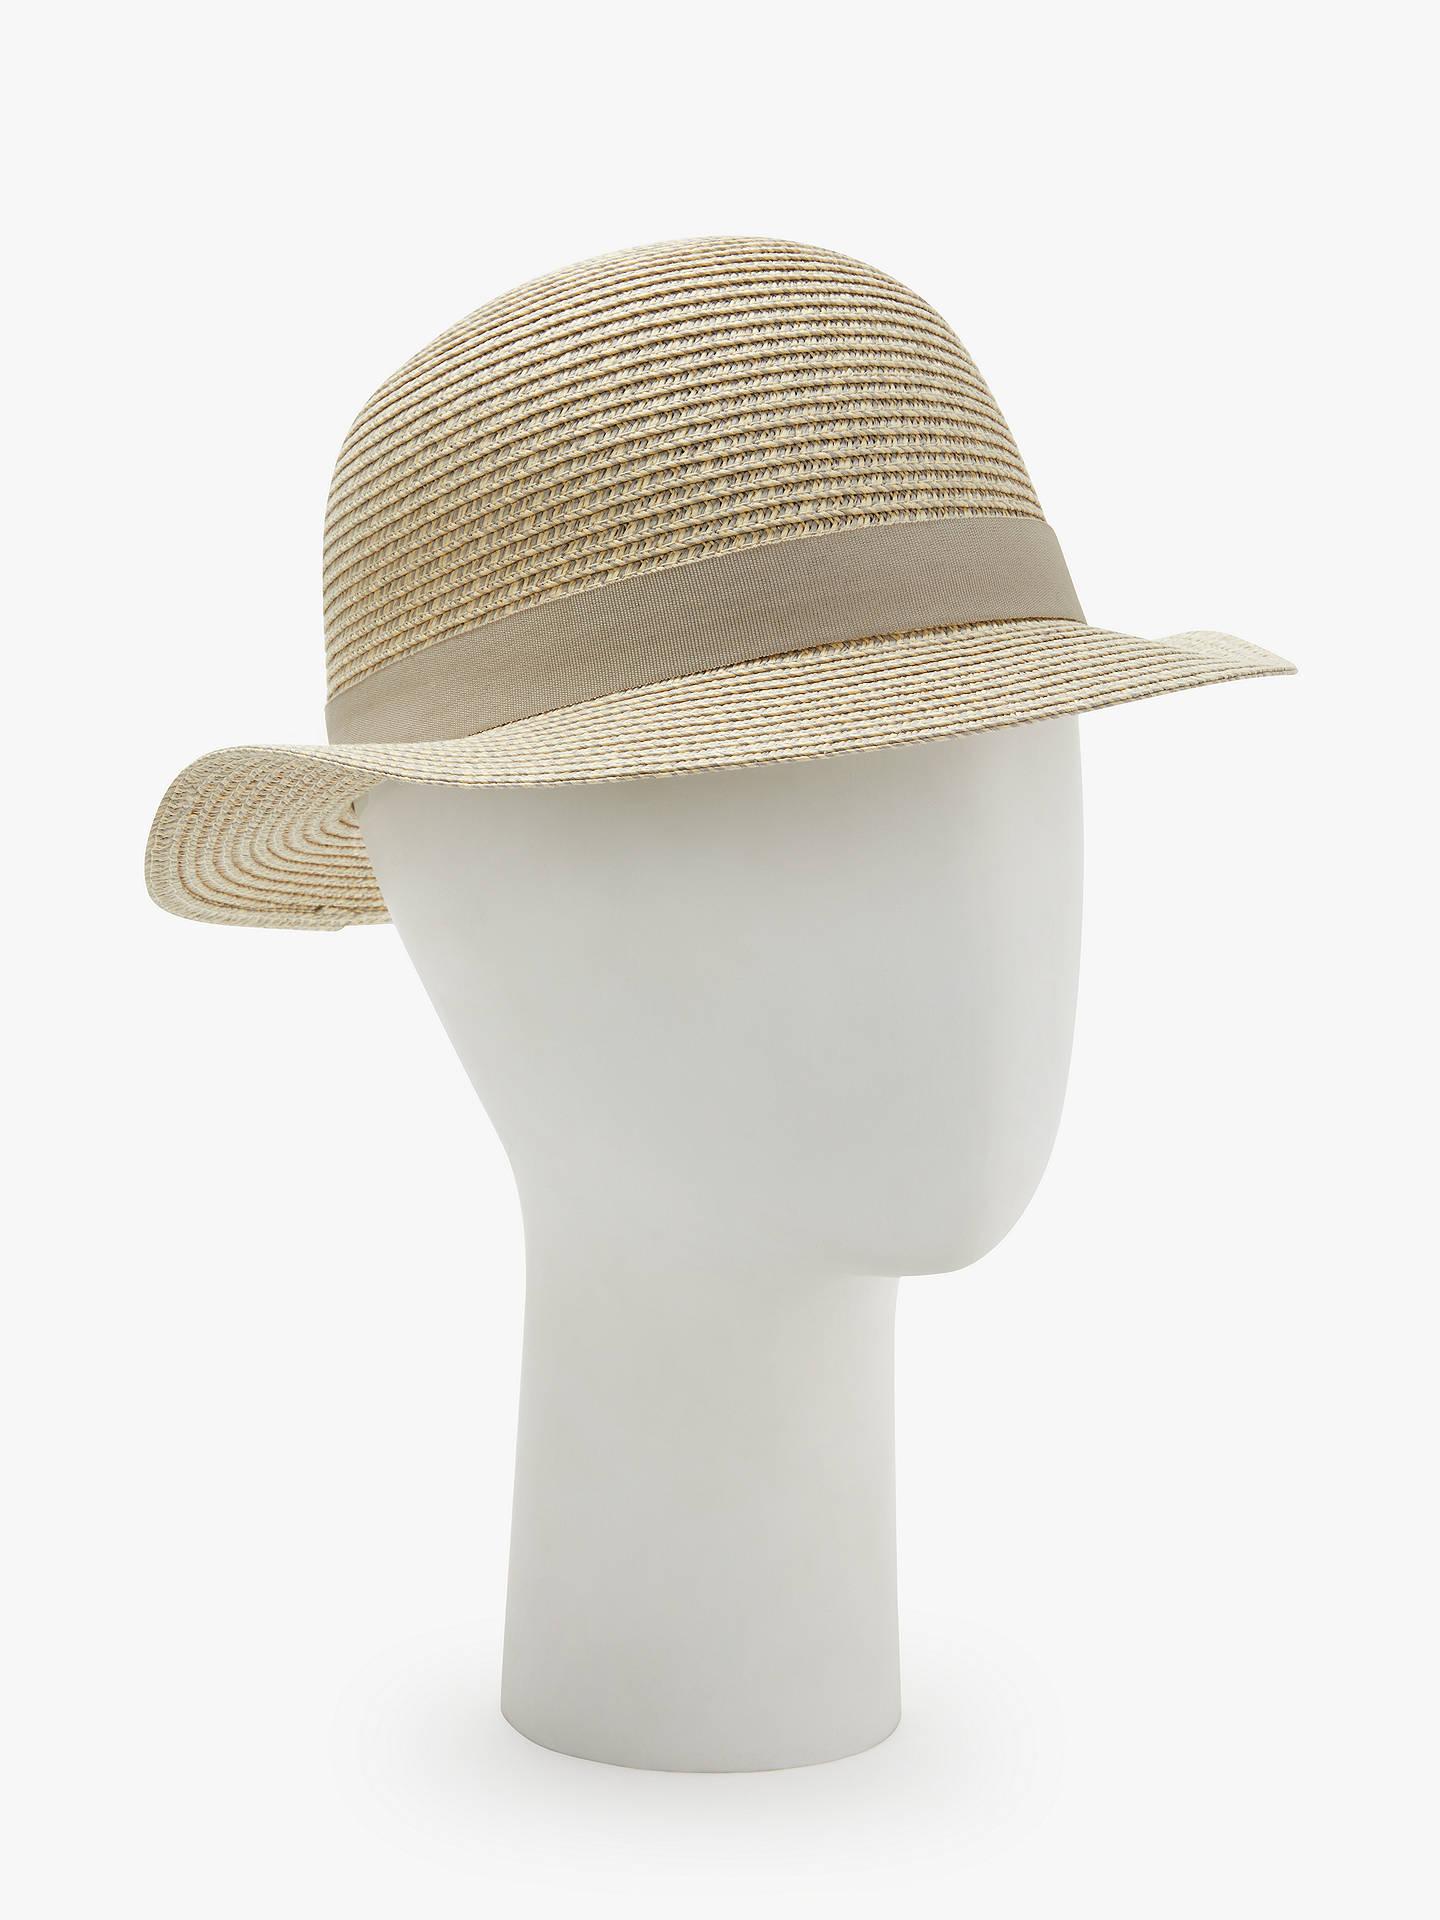 bb64b05f50122 ... Buy John Lewis   Partners Packable Small Brim Sun Hat